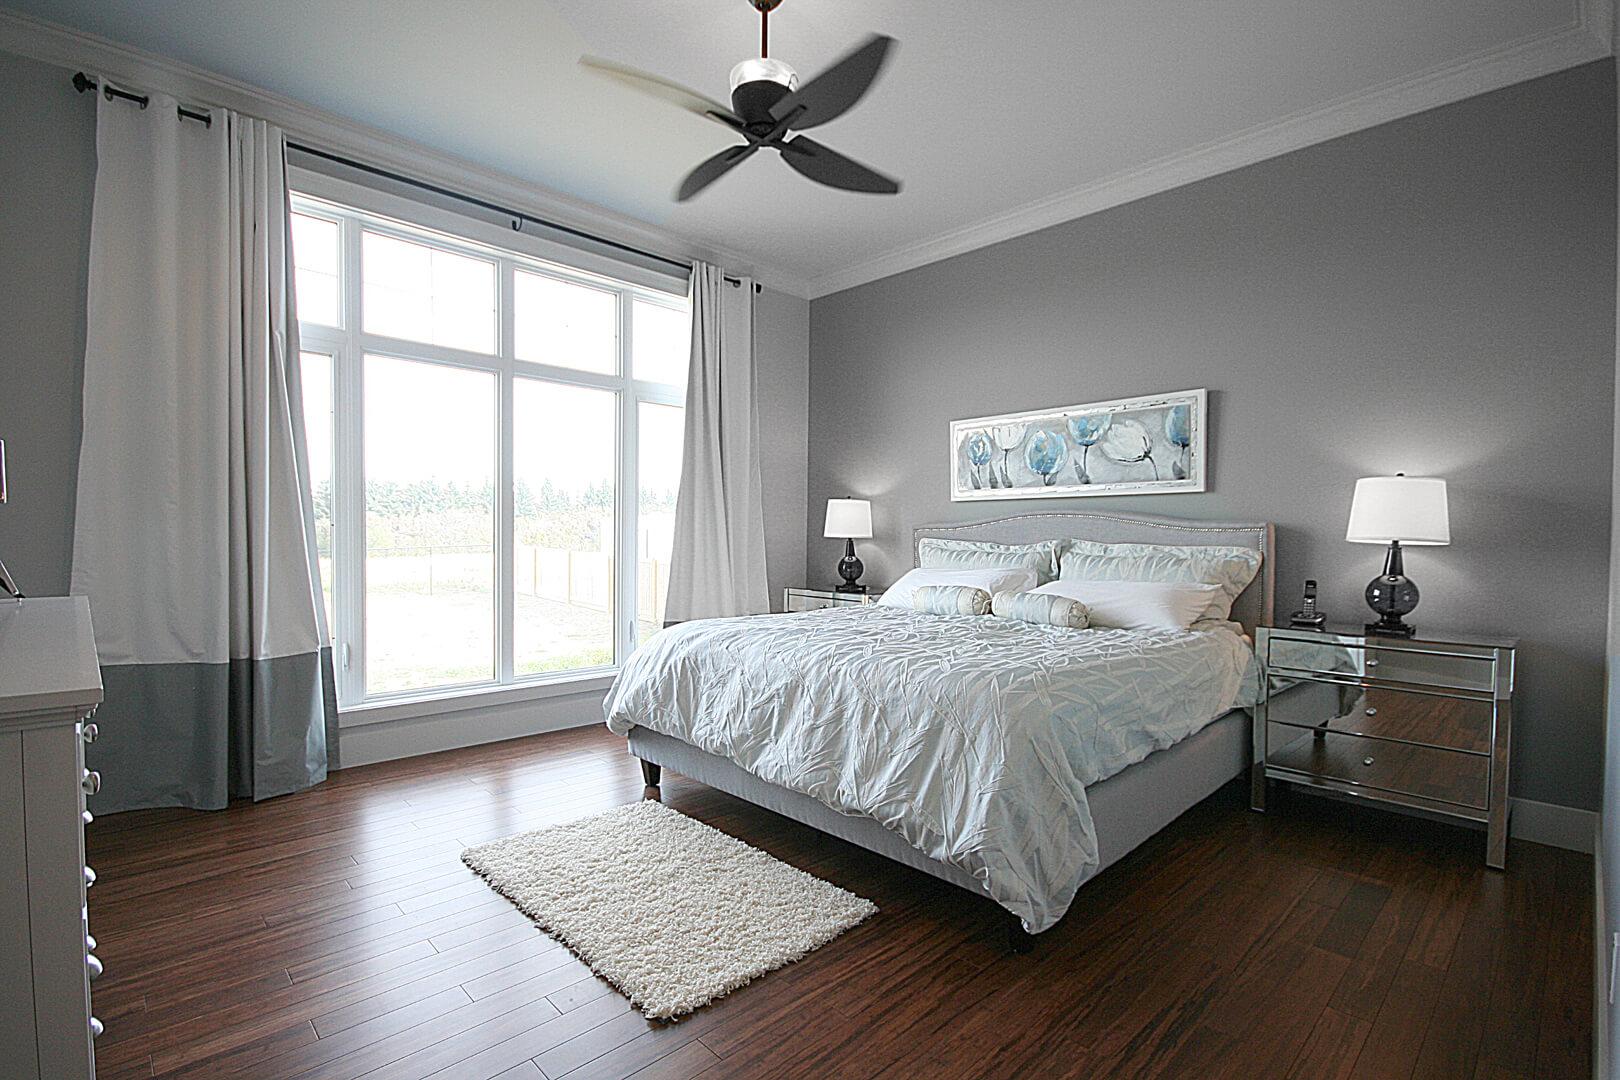 shearing_rococo-homes_master-bedroom